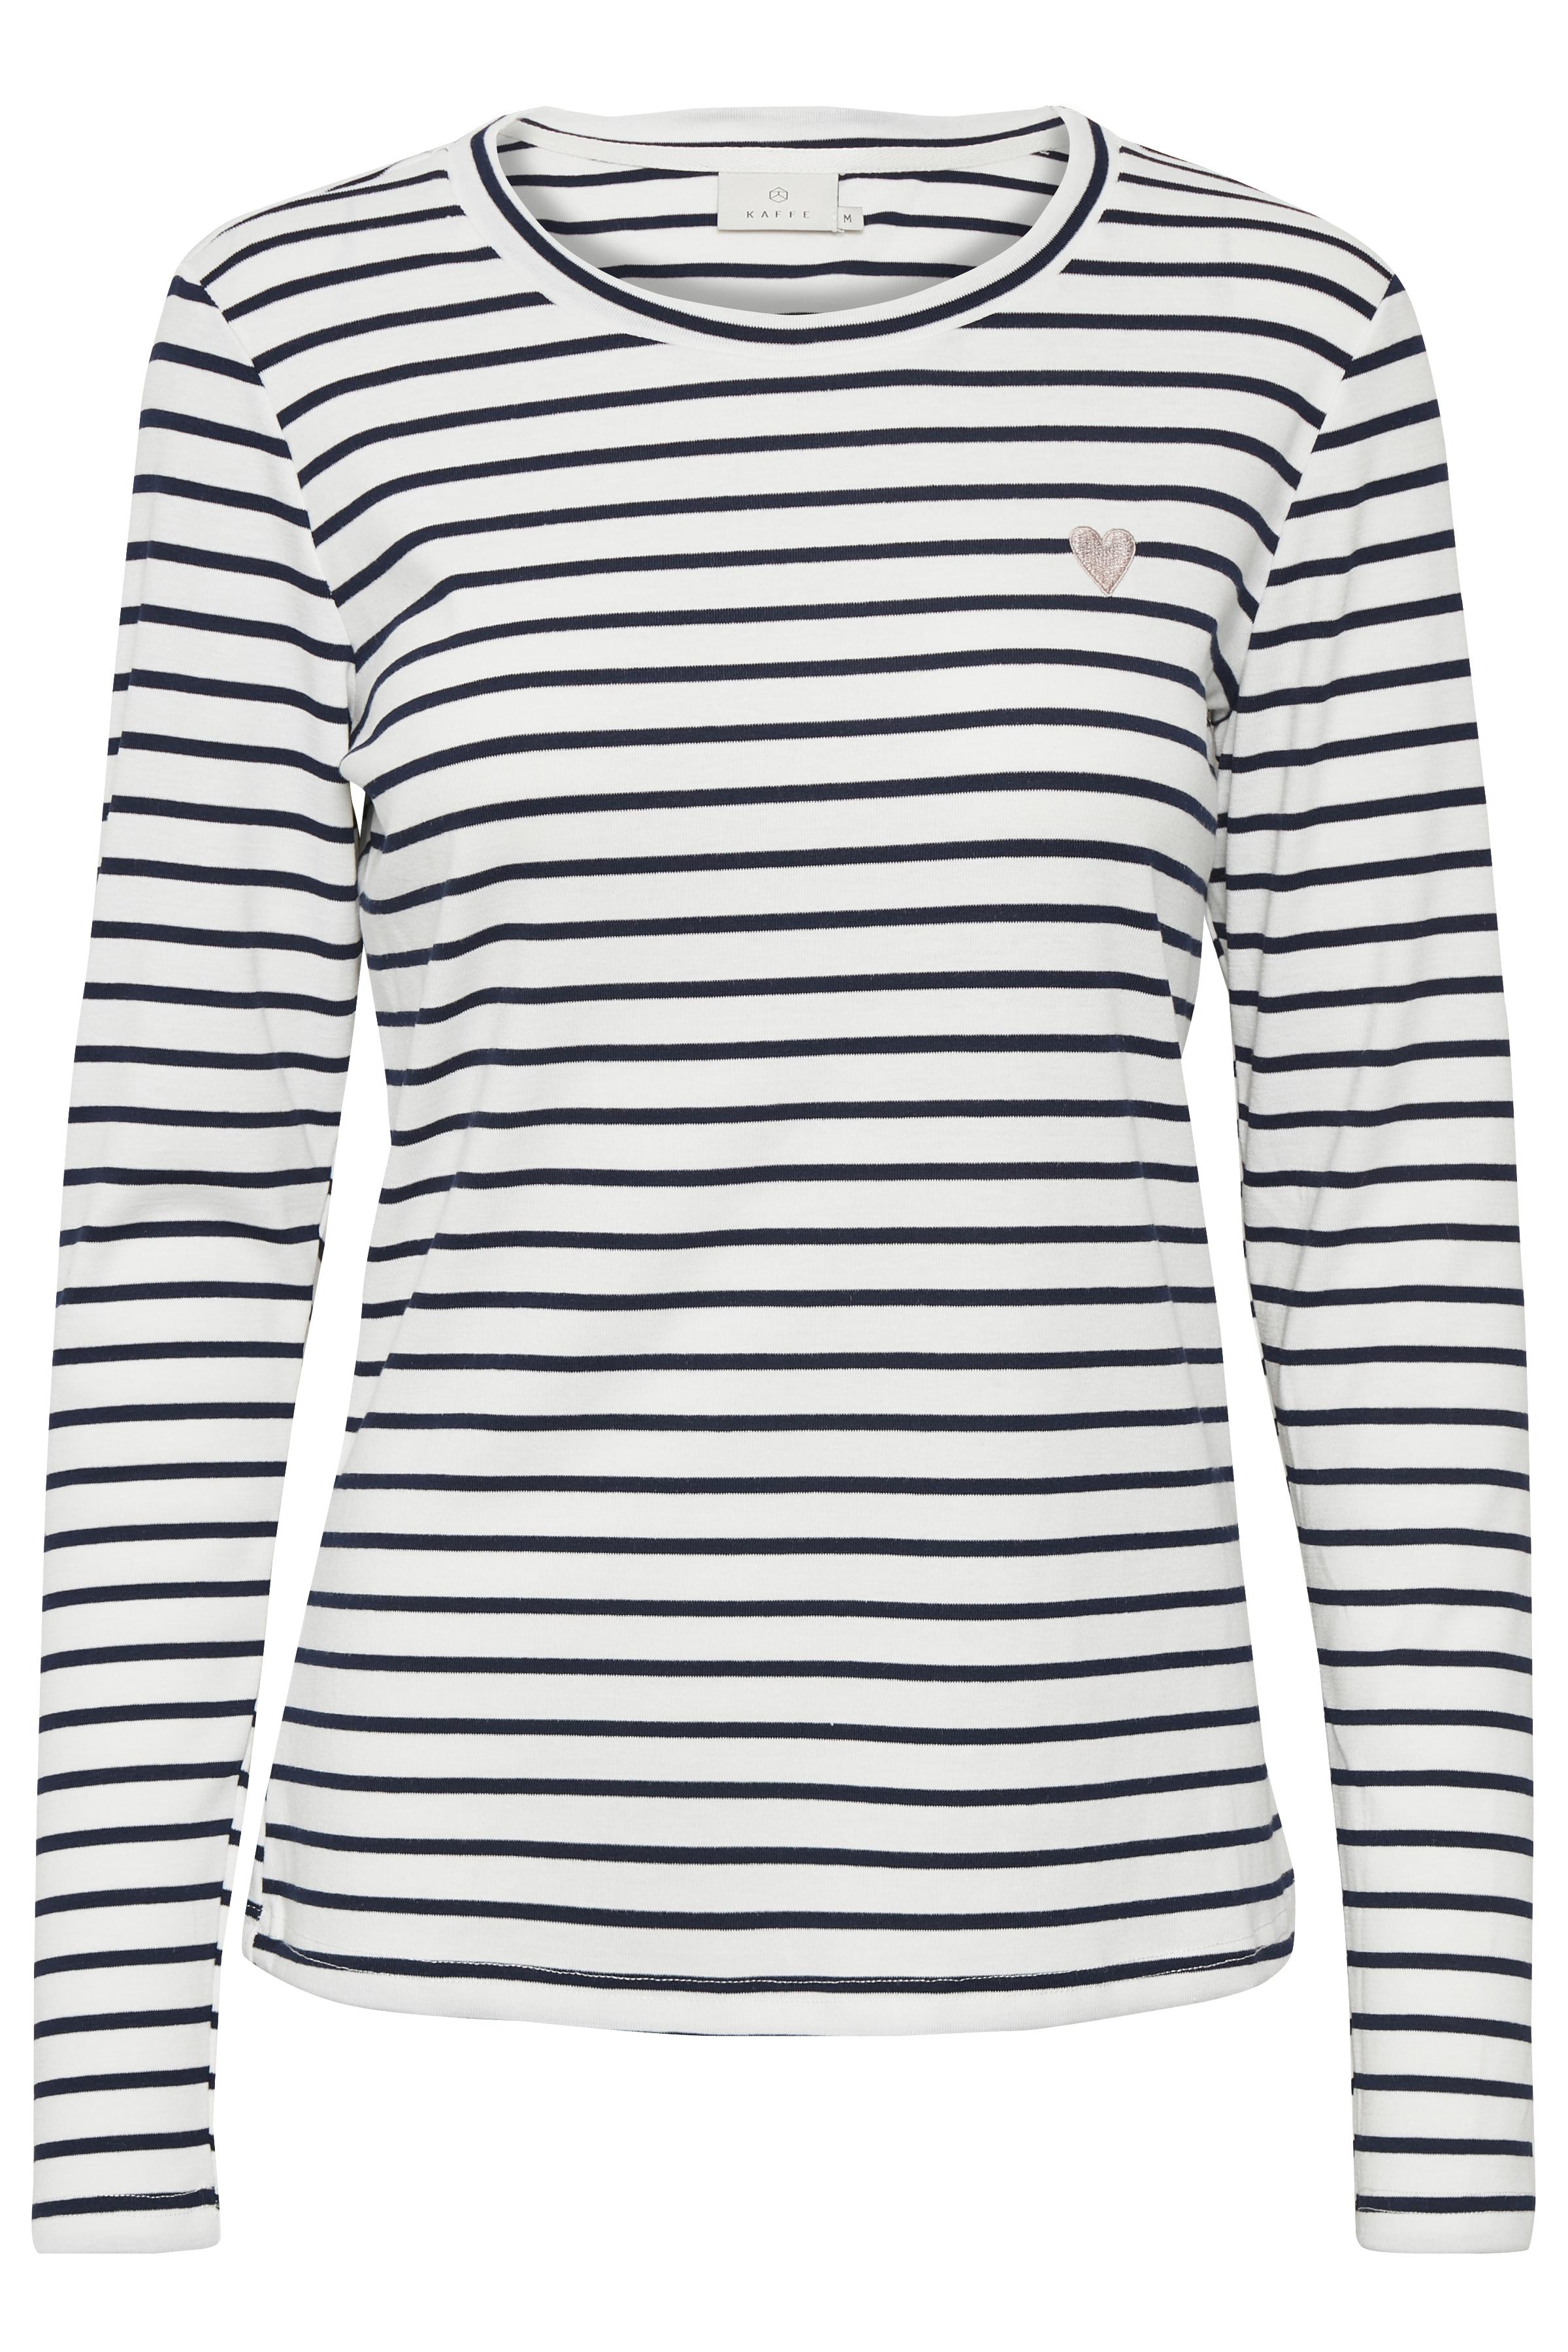 Off-white/marineblå Langærmet bluse fra Kaffe – Køb Off-white/marineblå Langærmet bluse fra str. XS-XXL her